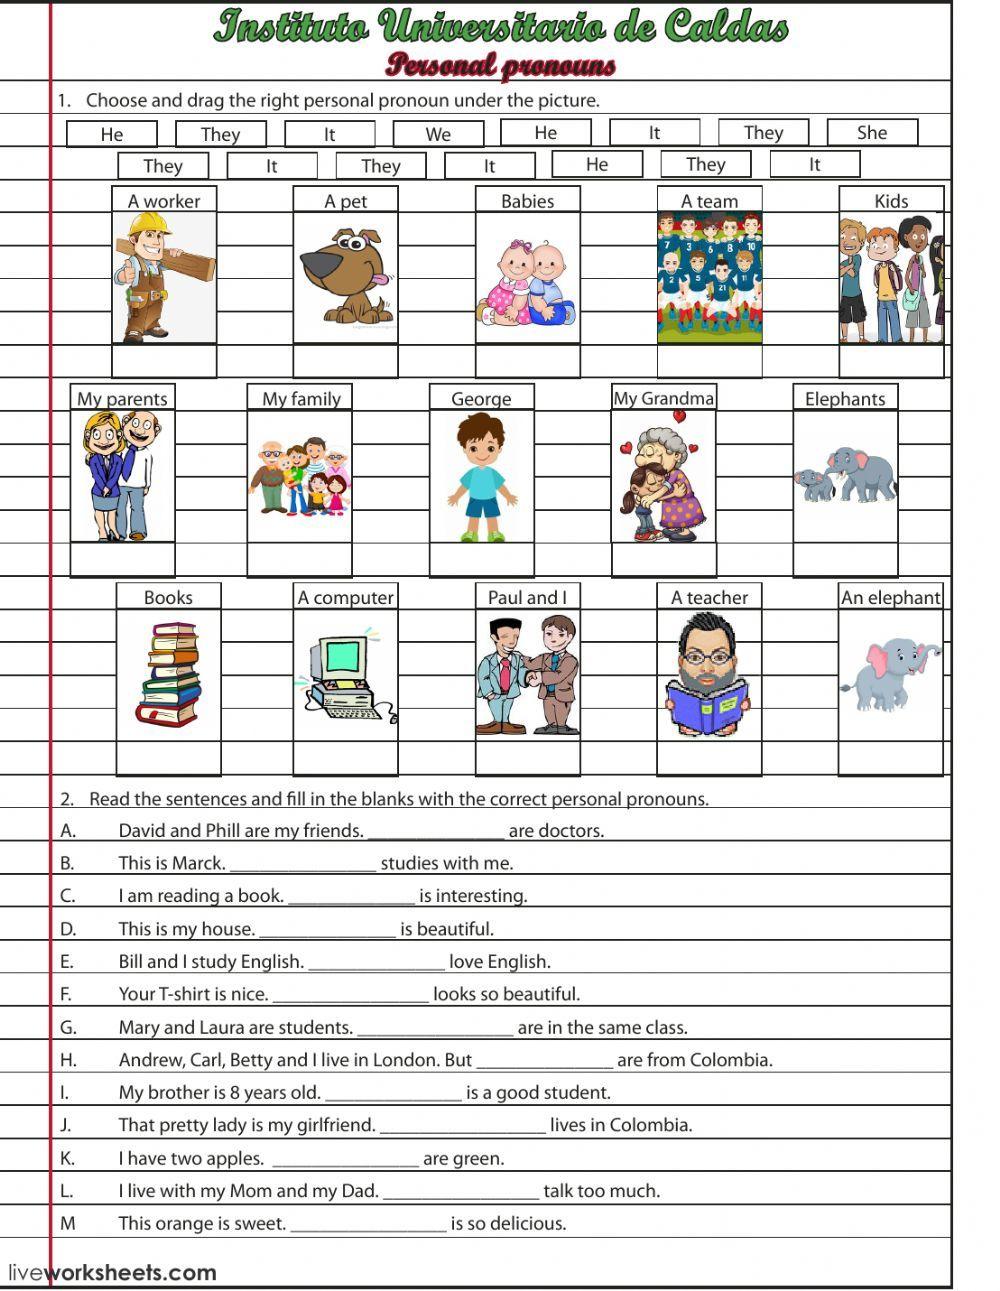 Personal Pronouns English As A Second Language Esl Worksheet This Is An Interacti Pronombre Personal Actividades Interactivas Actividades Con Los Pronombres